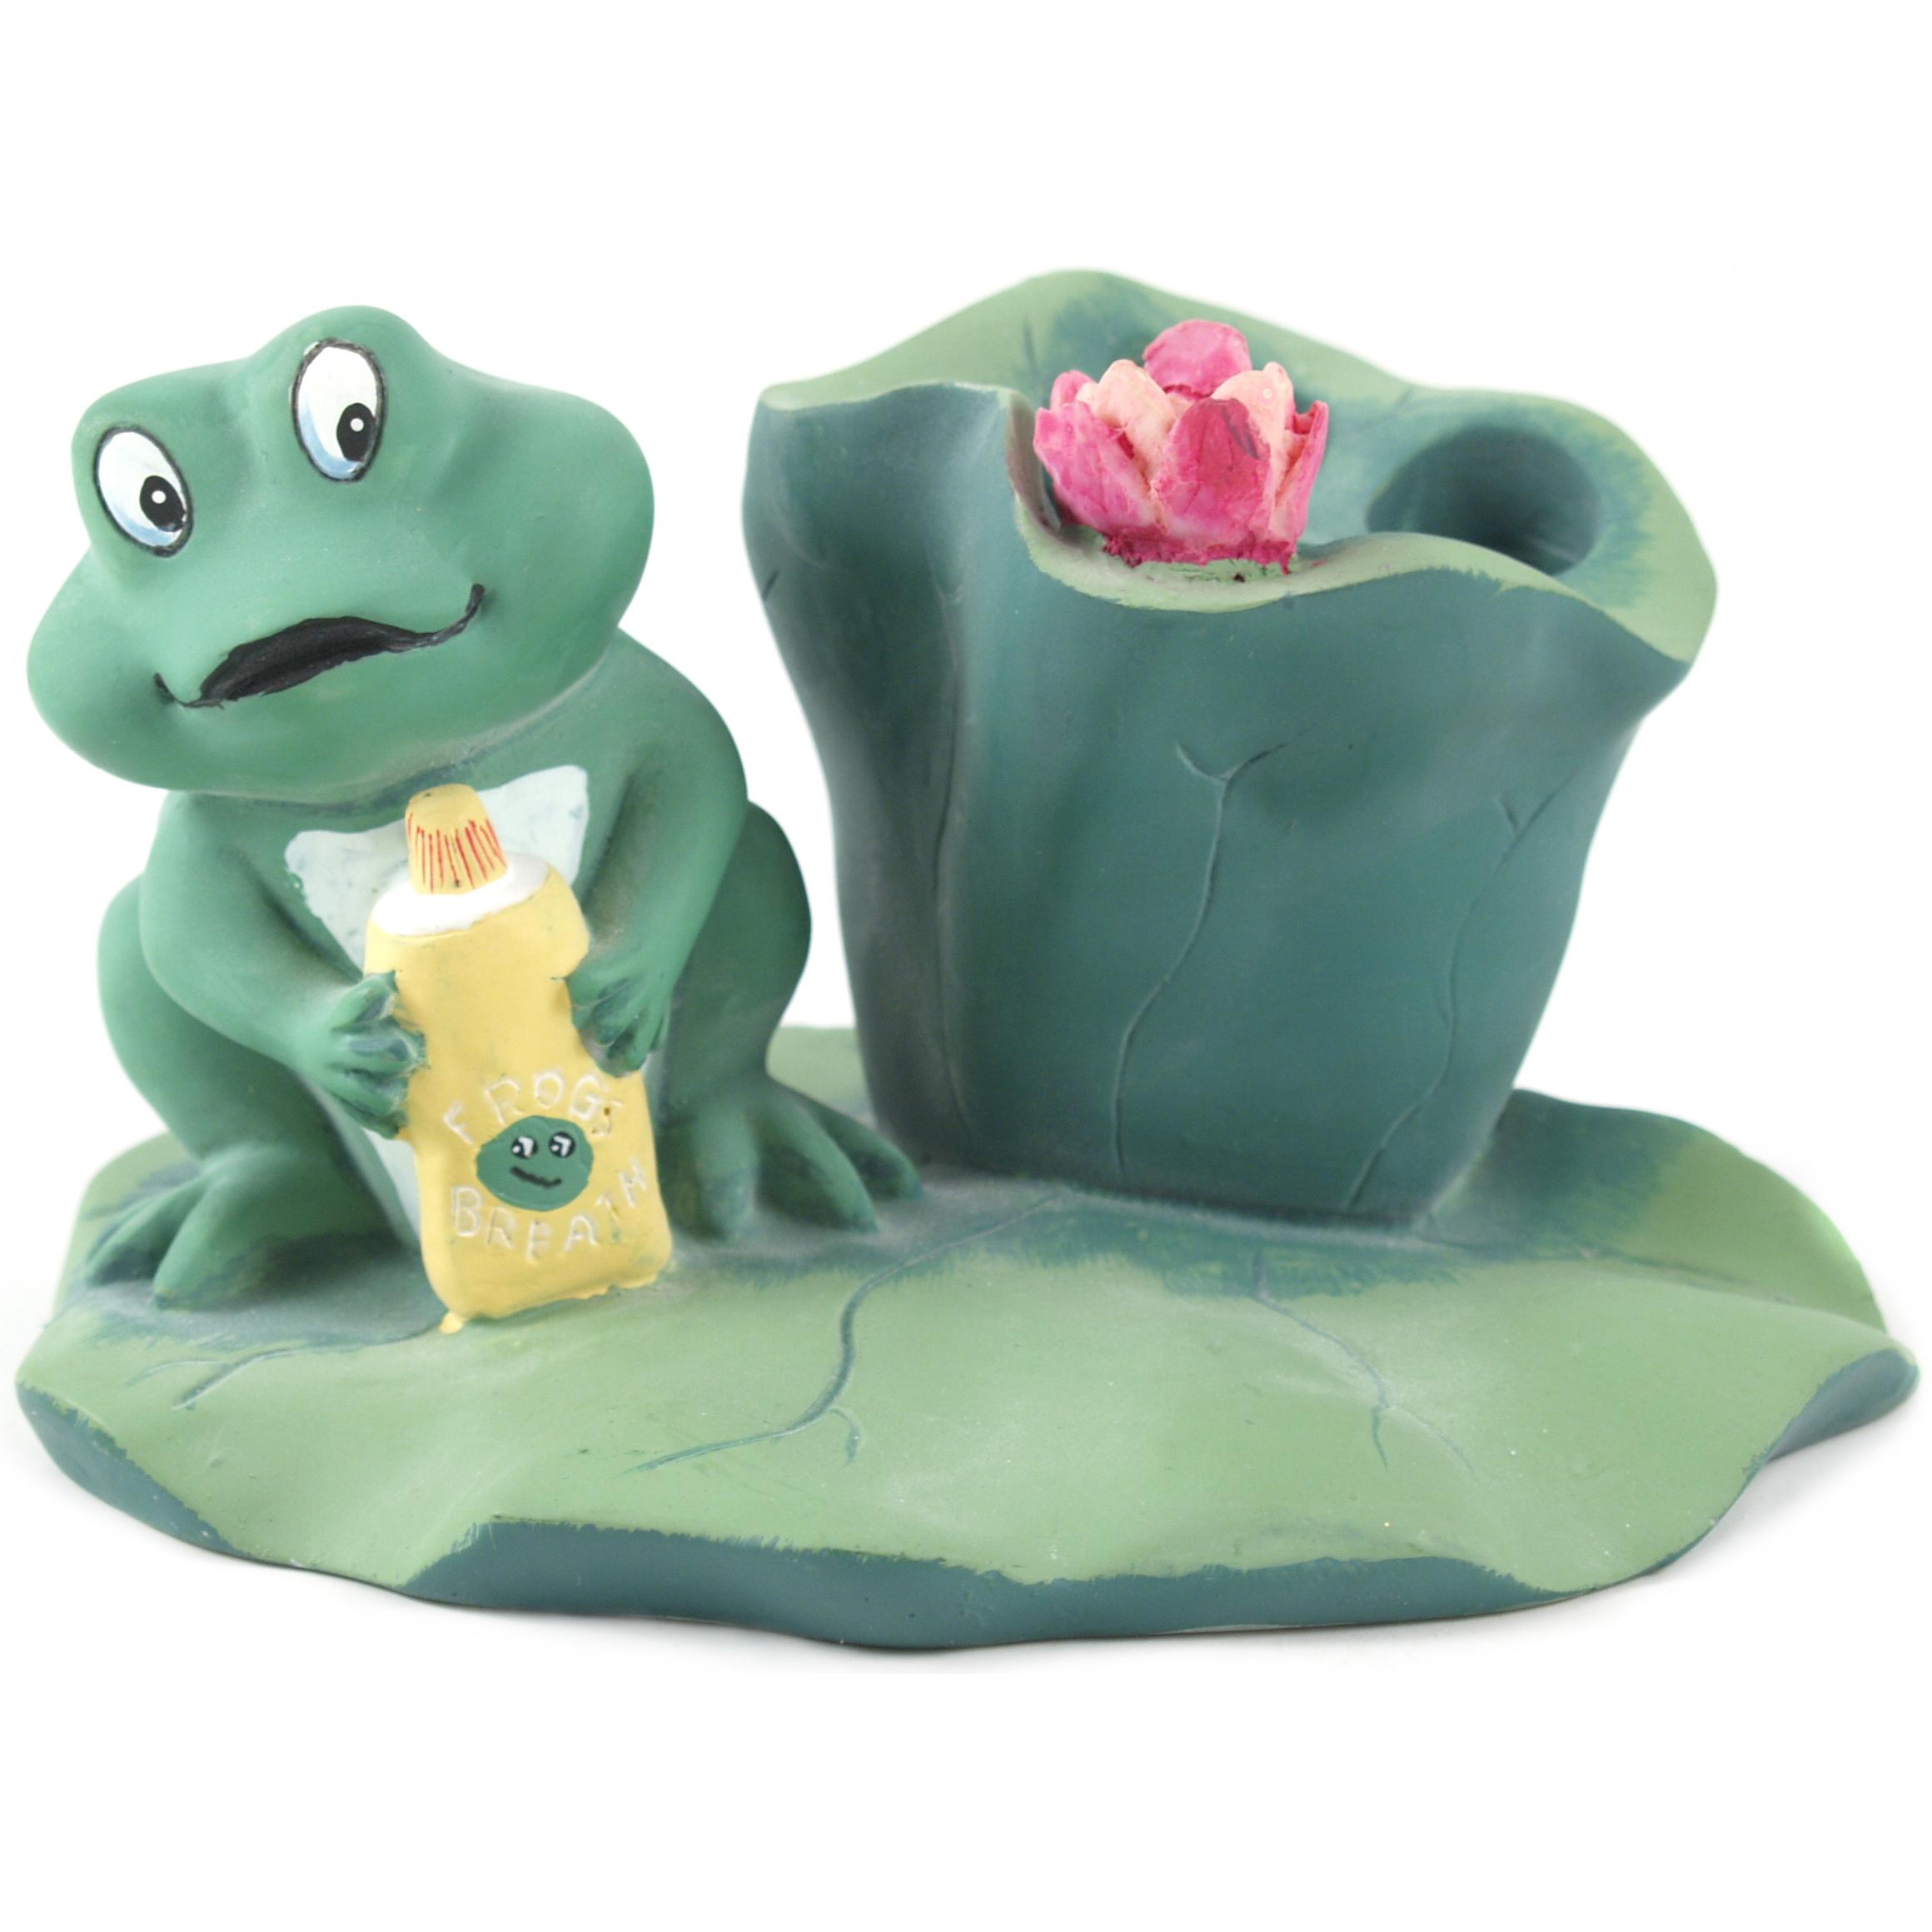 Froggy Toothbrush Holder